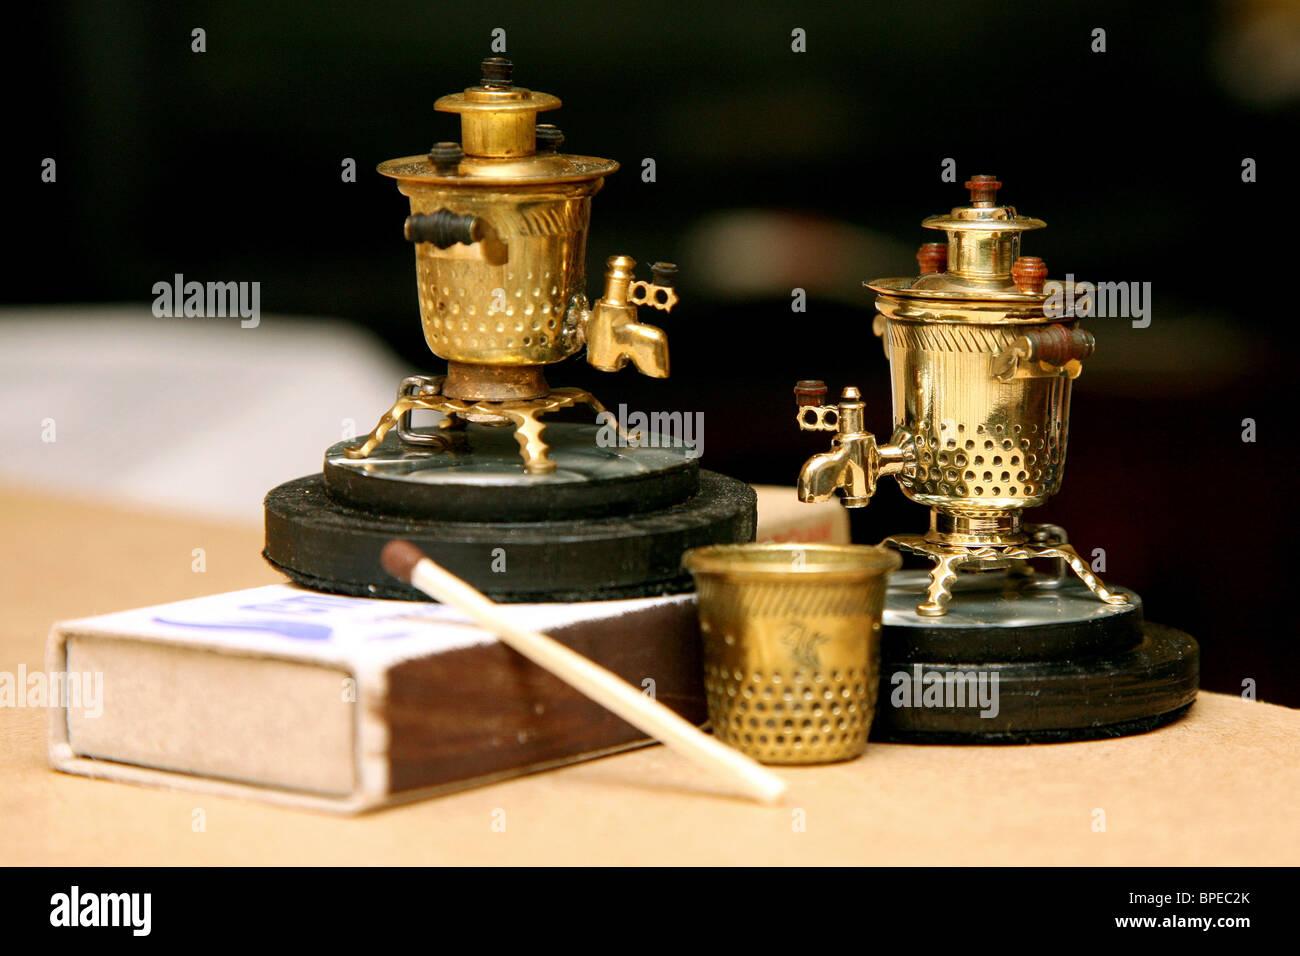 Tiny samovars crafted in Tula - Stock Image